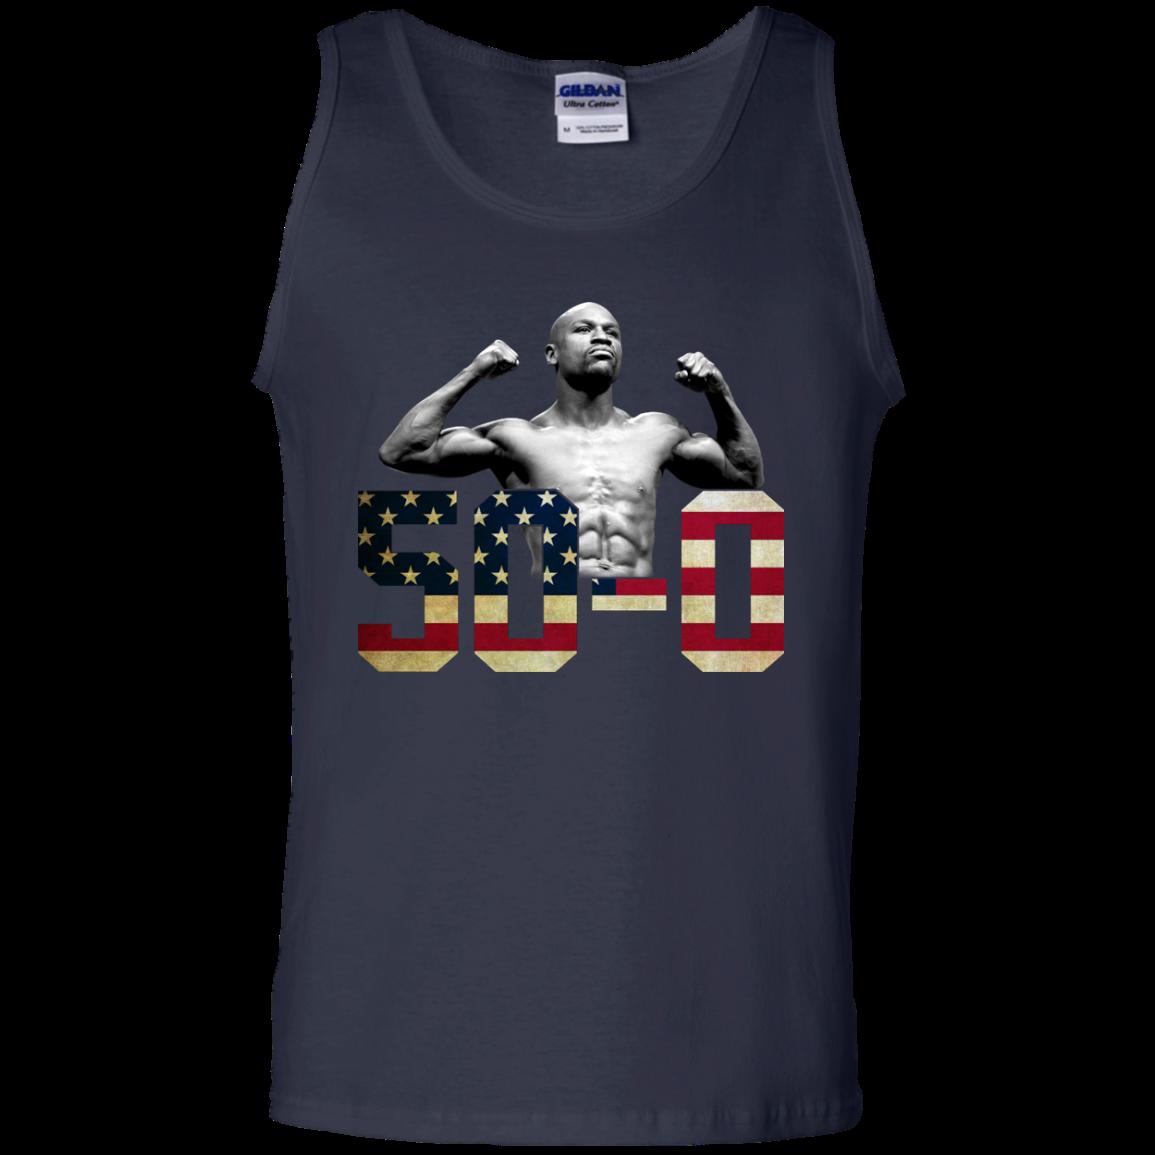 image 510px Floyd Mayweather 50 0 Shirt, Hoodies, Tank